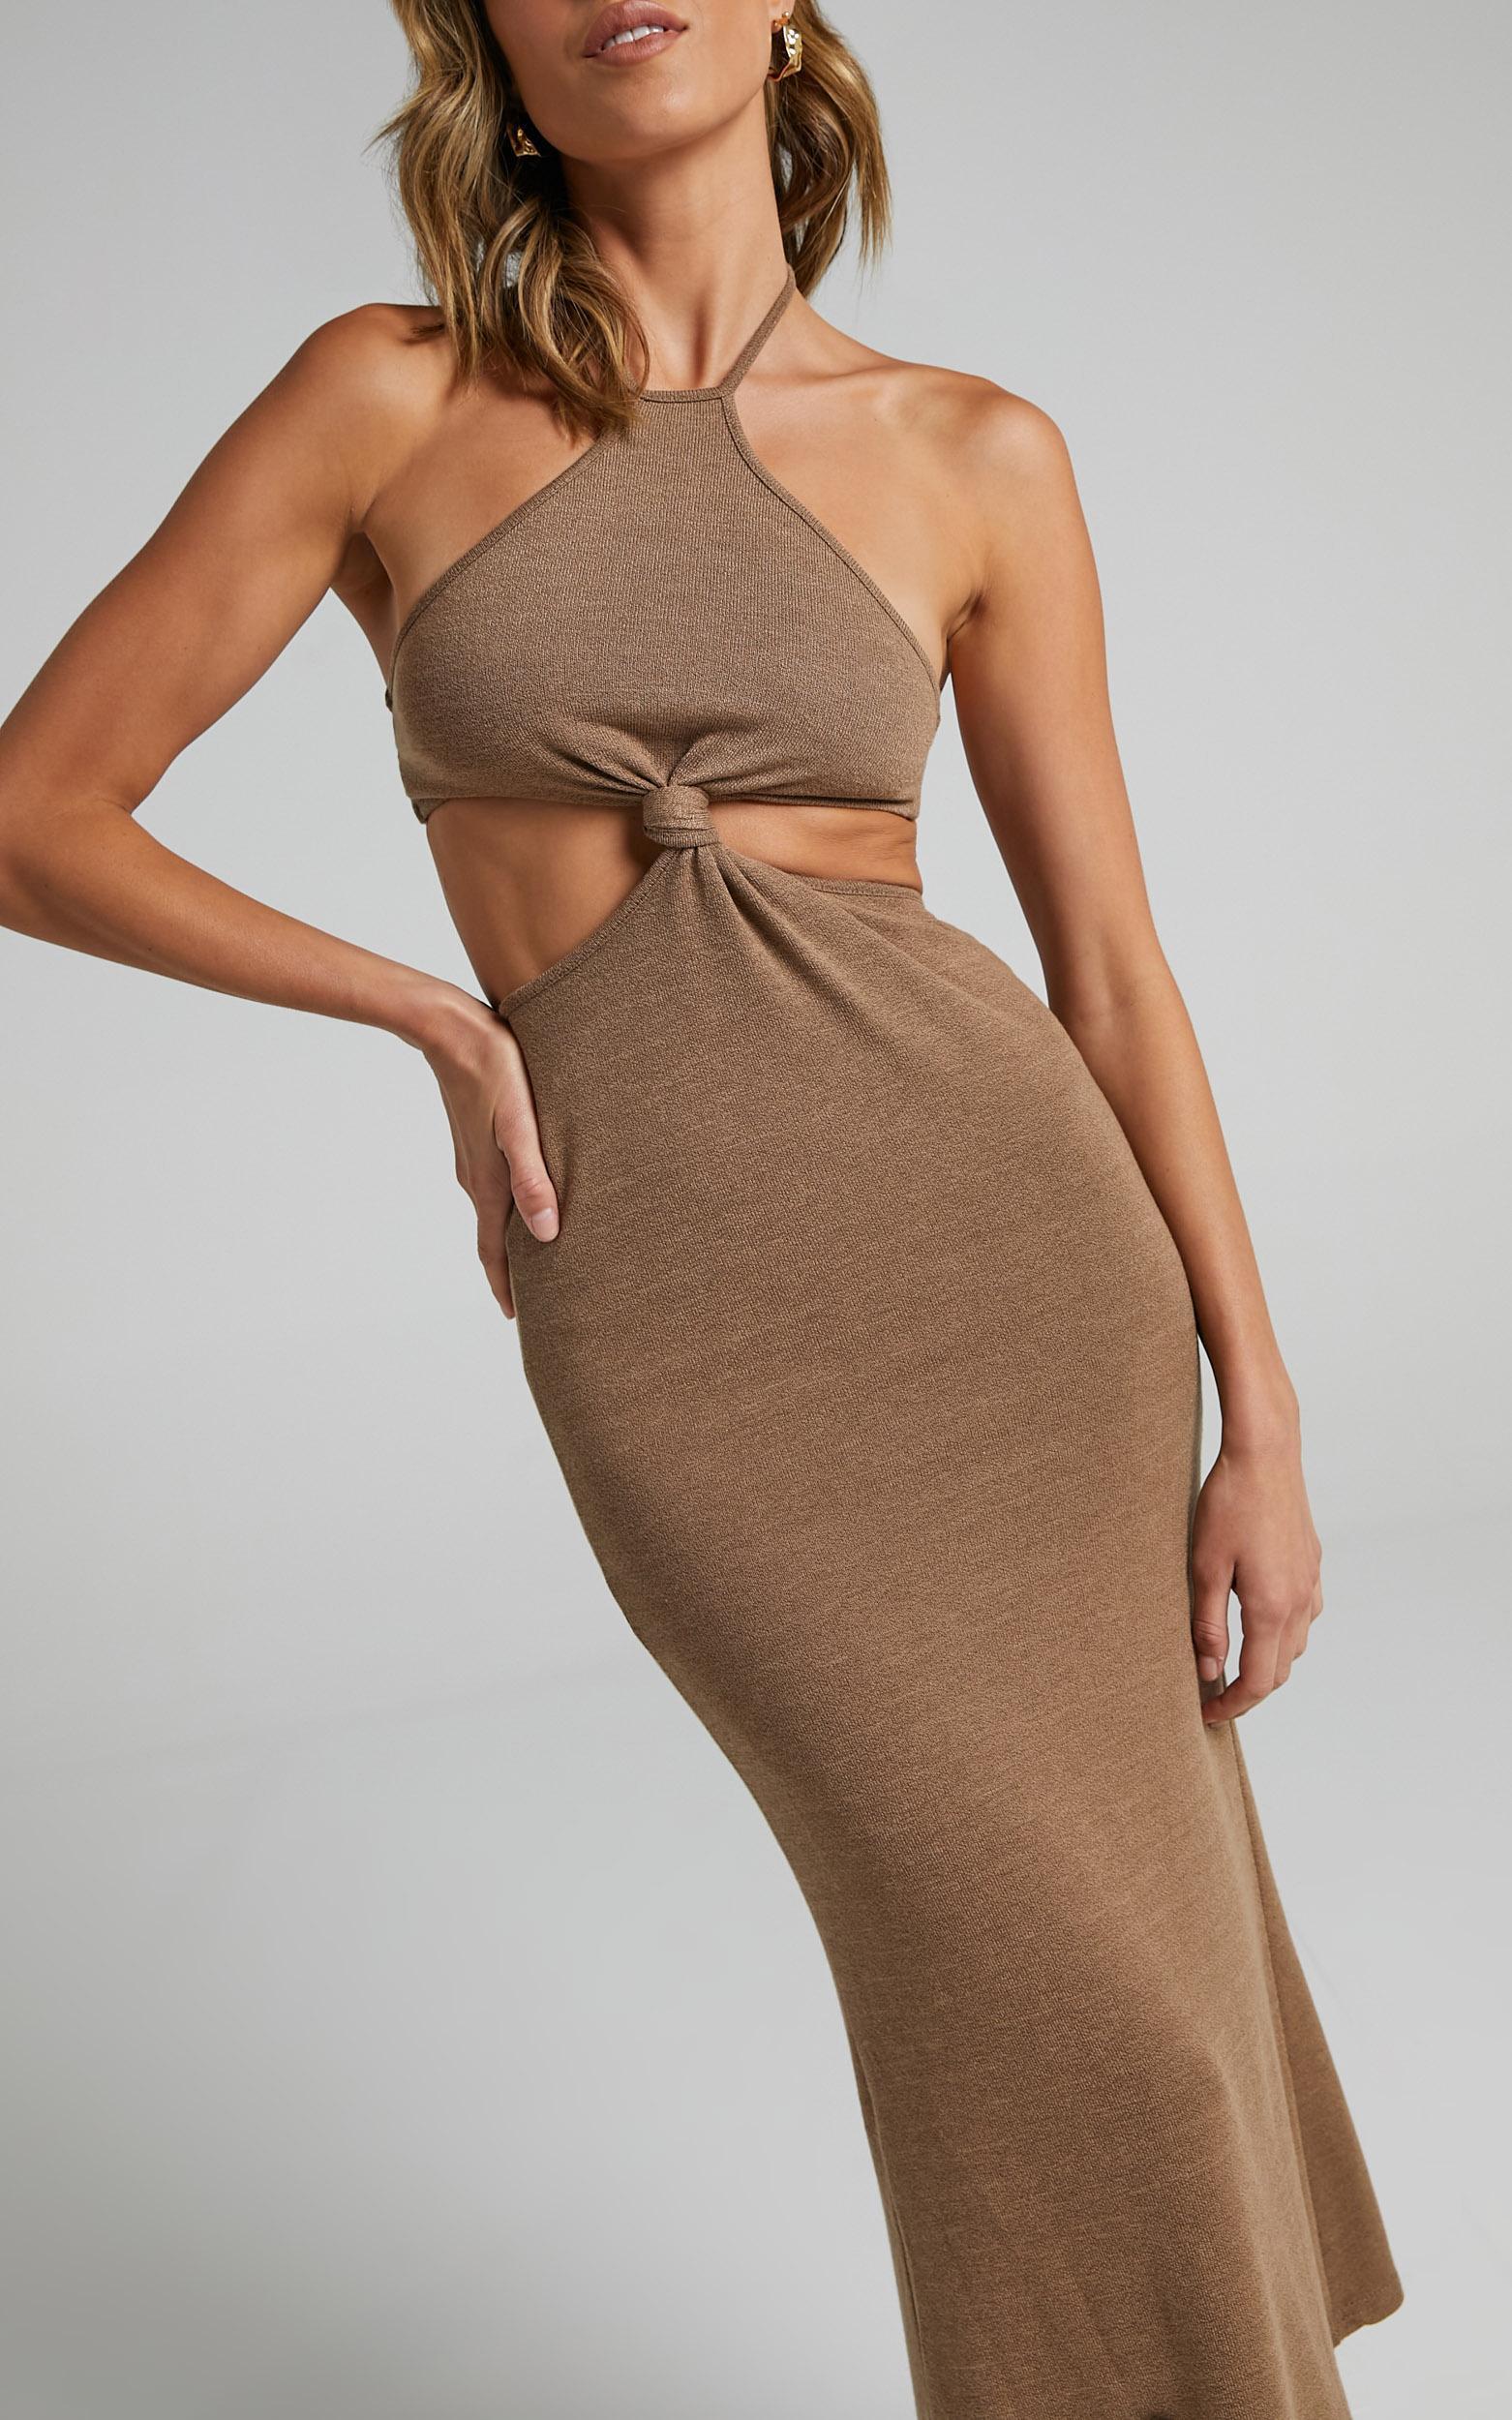 SHANIA DRESS IN BROWN $64.95